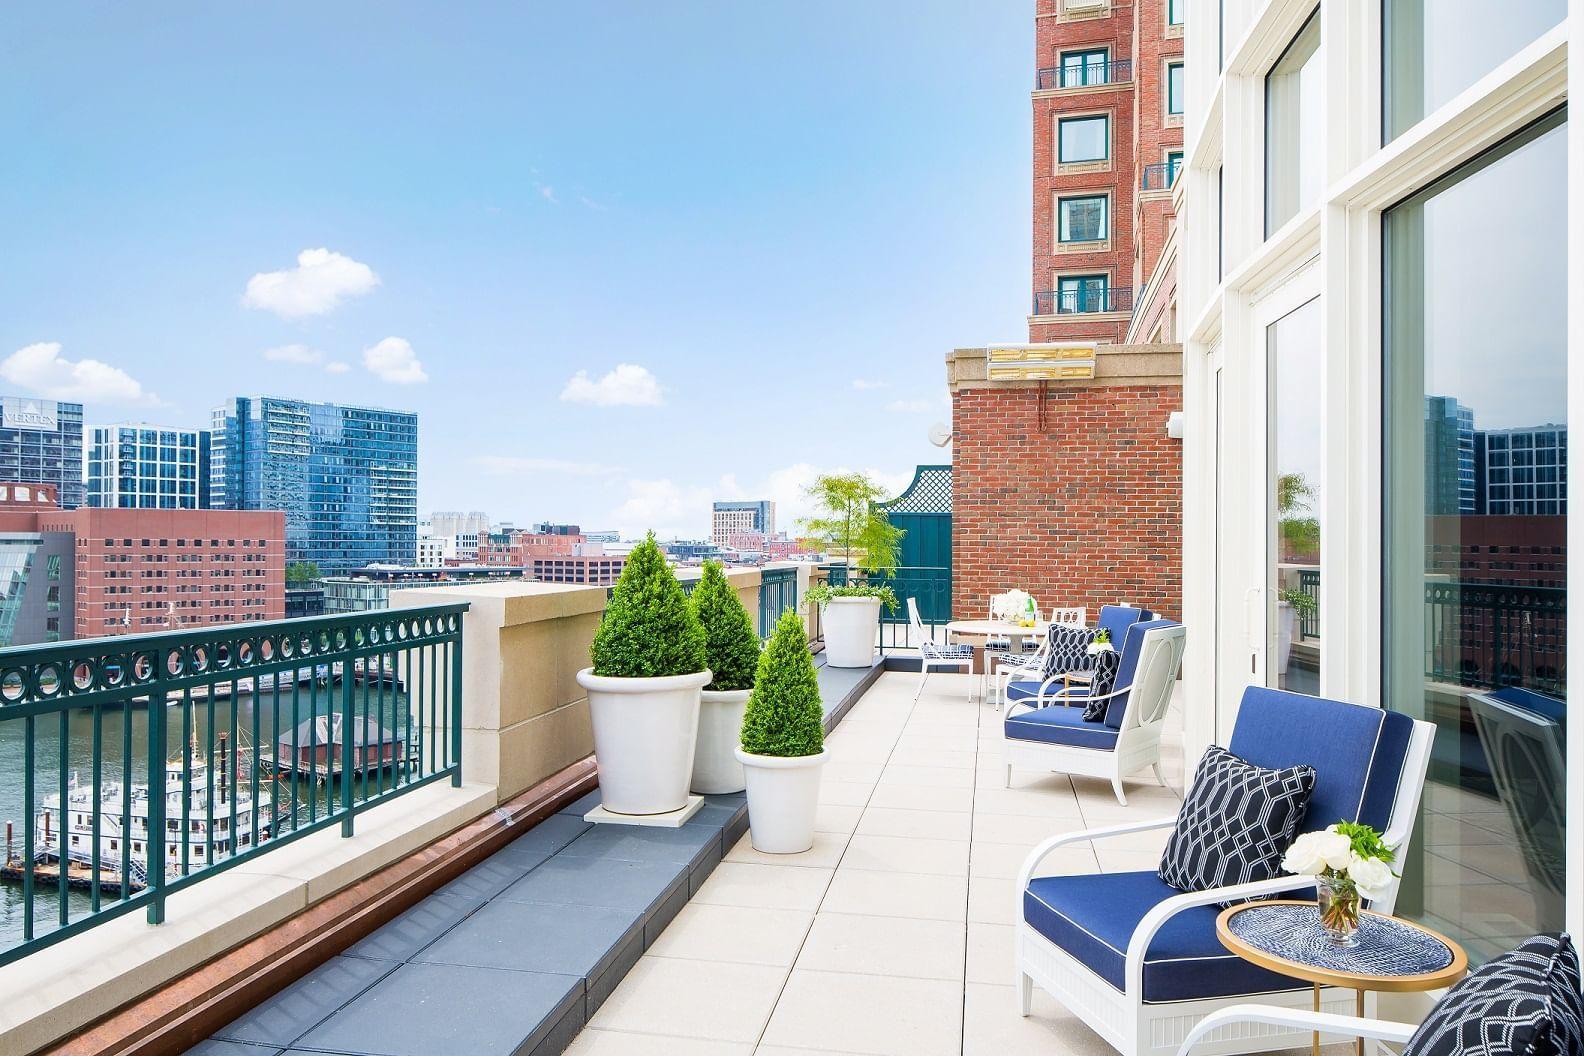 Presidential Suite terrace overlooking Boston Harbor